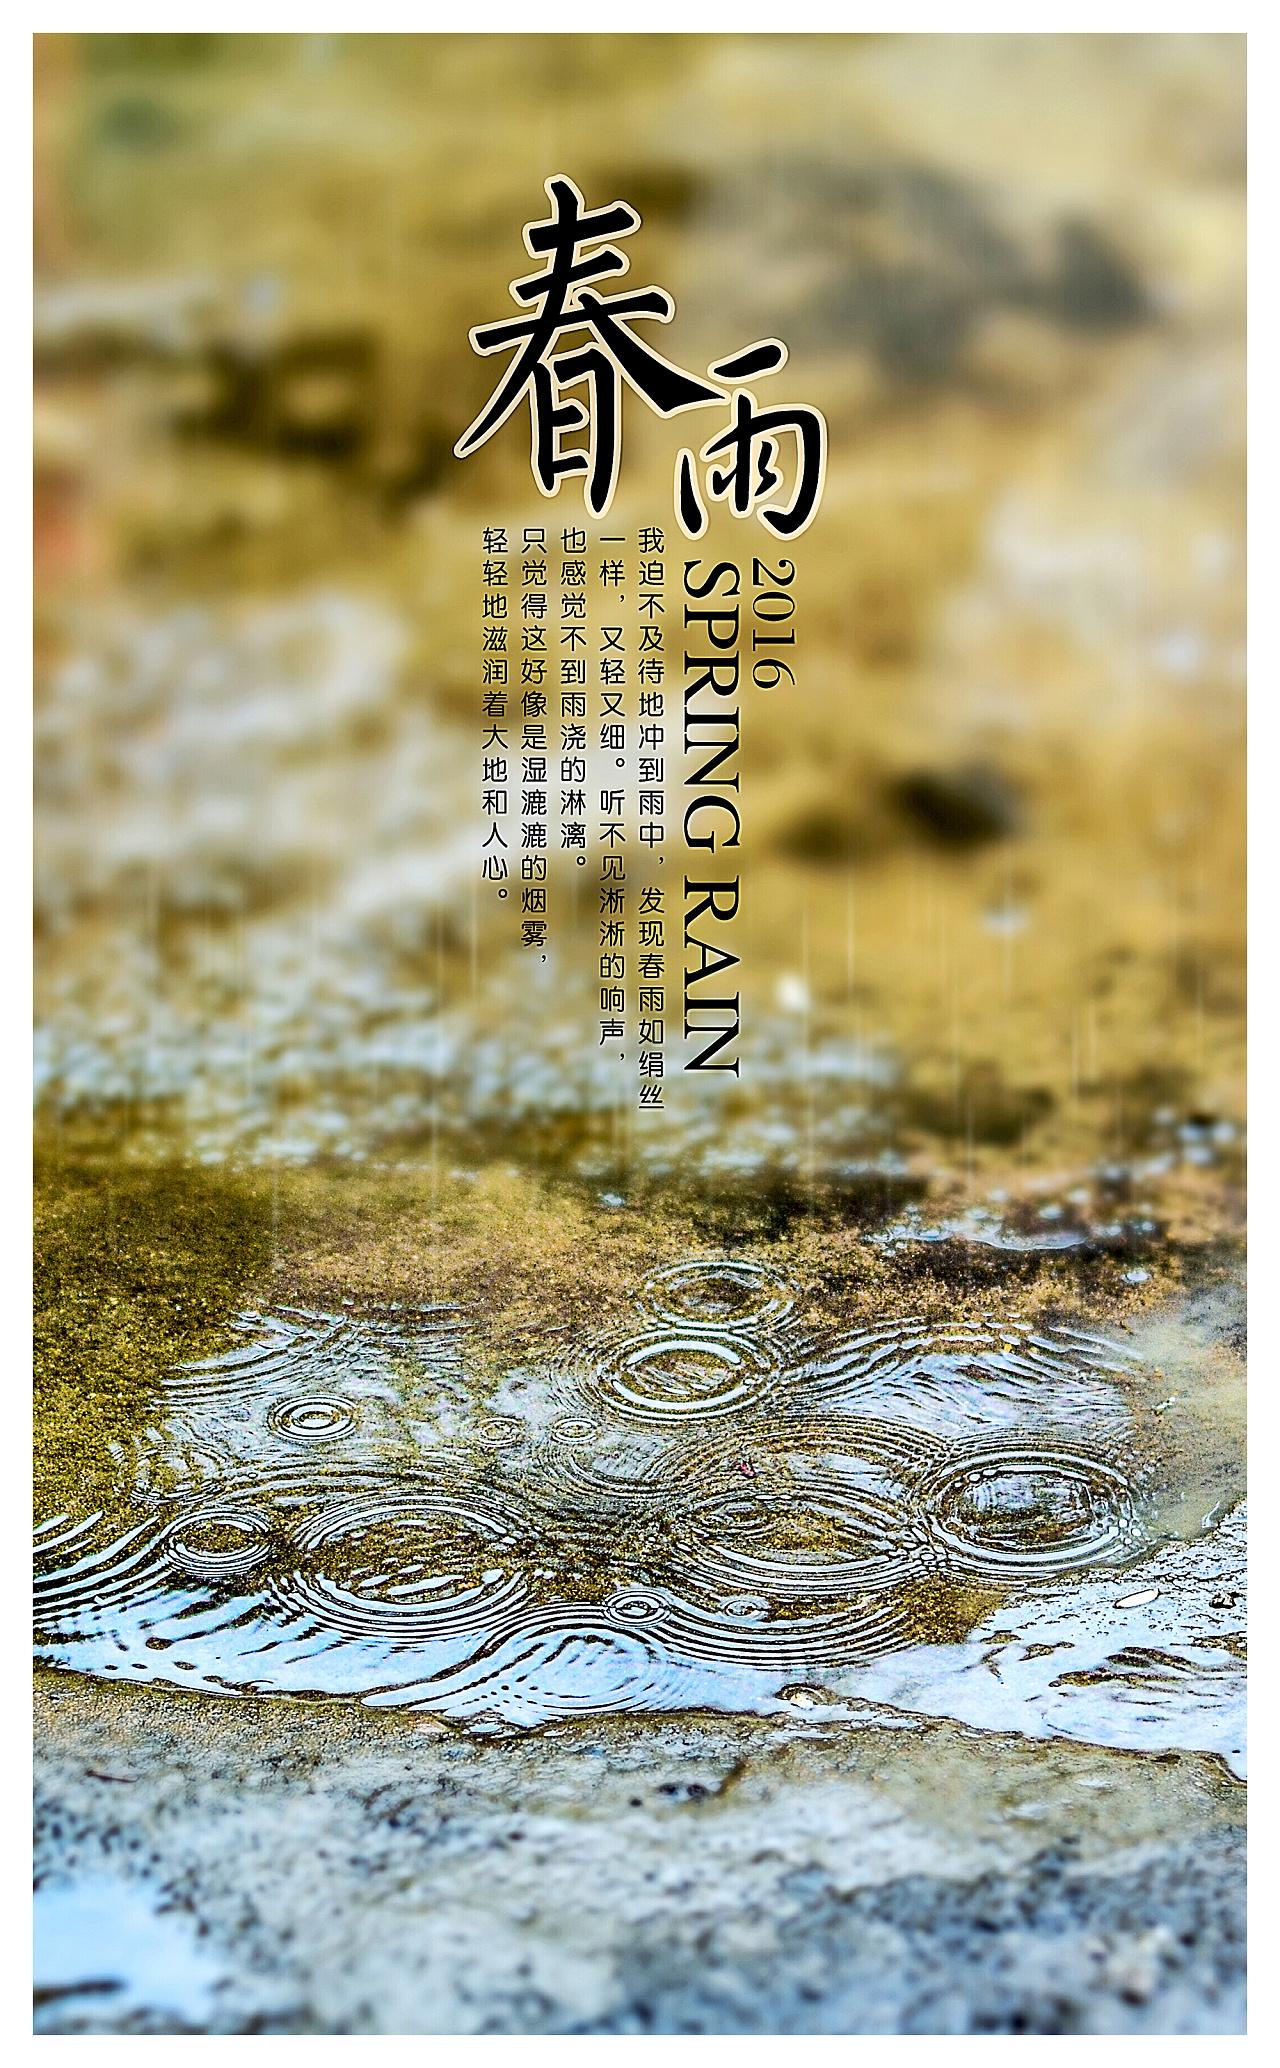 �r,_小雨淅淅沥沥的下  屋檐下的雨 水滴特写 复苏的木苔 木苔特写 春雨